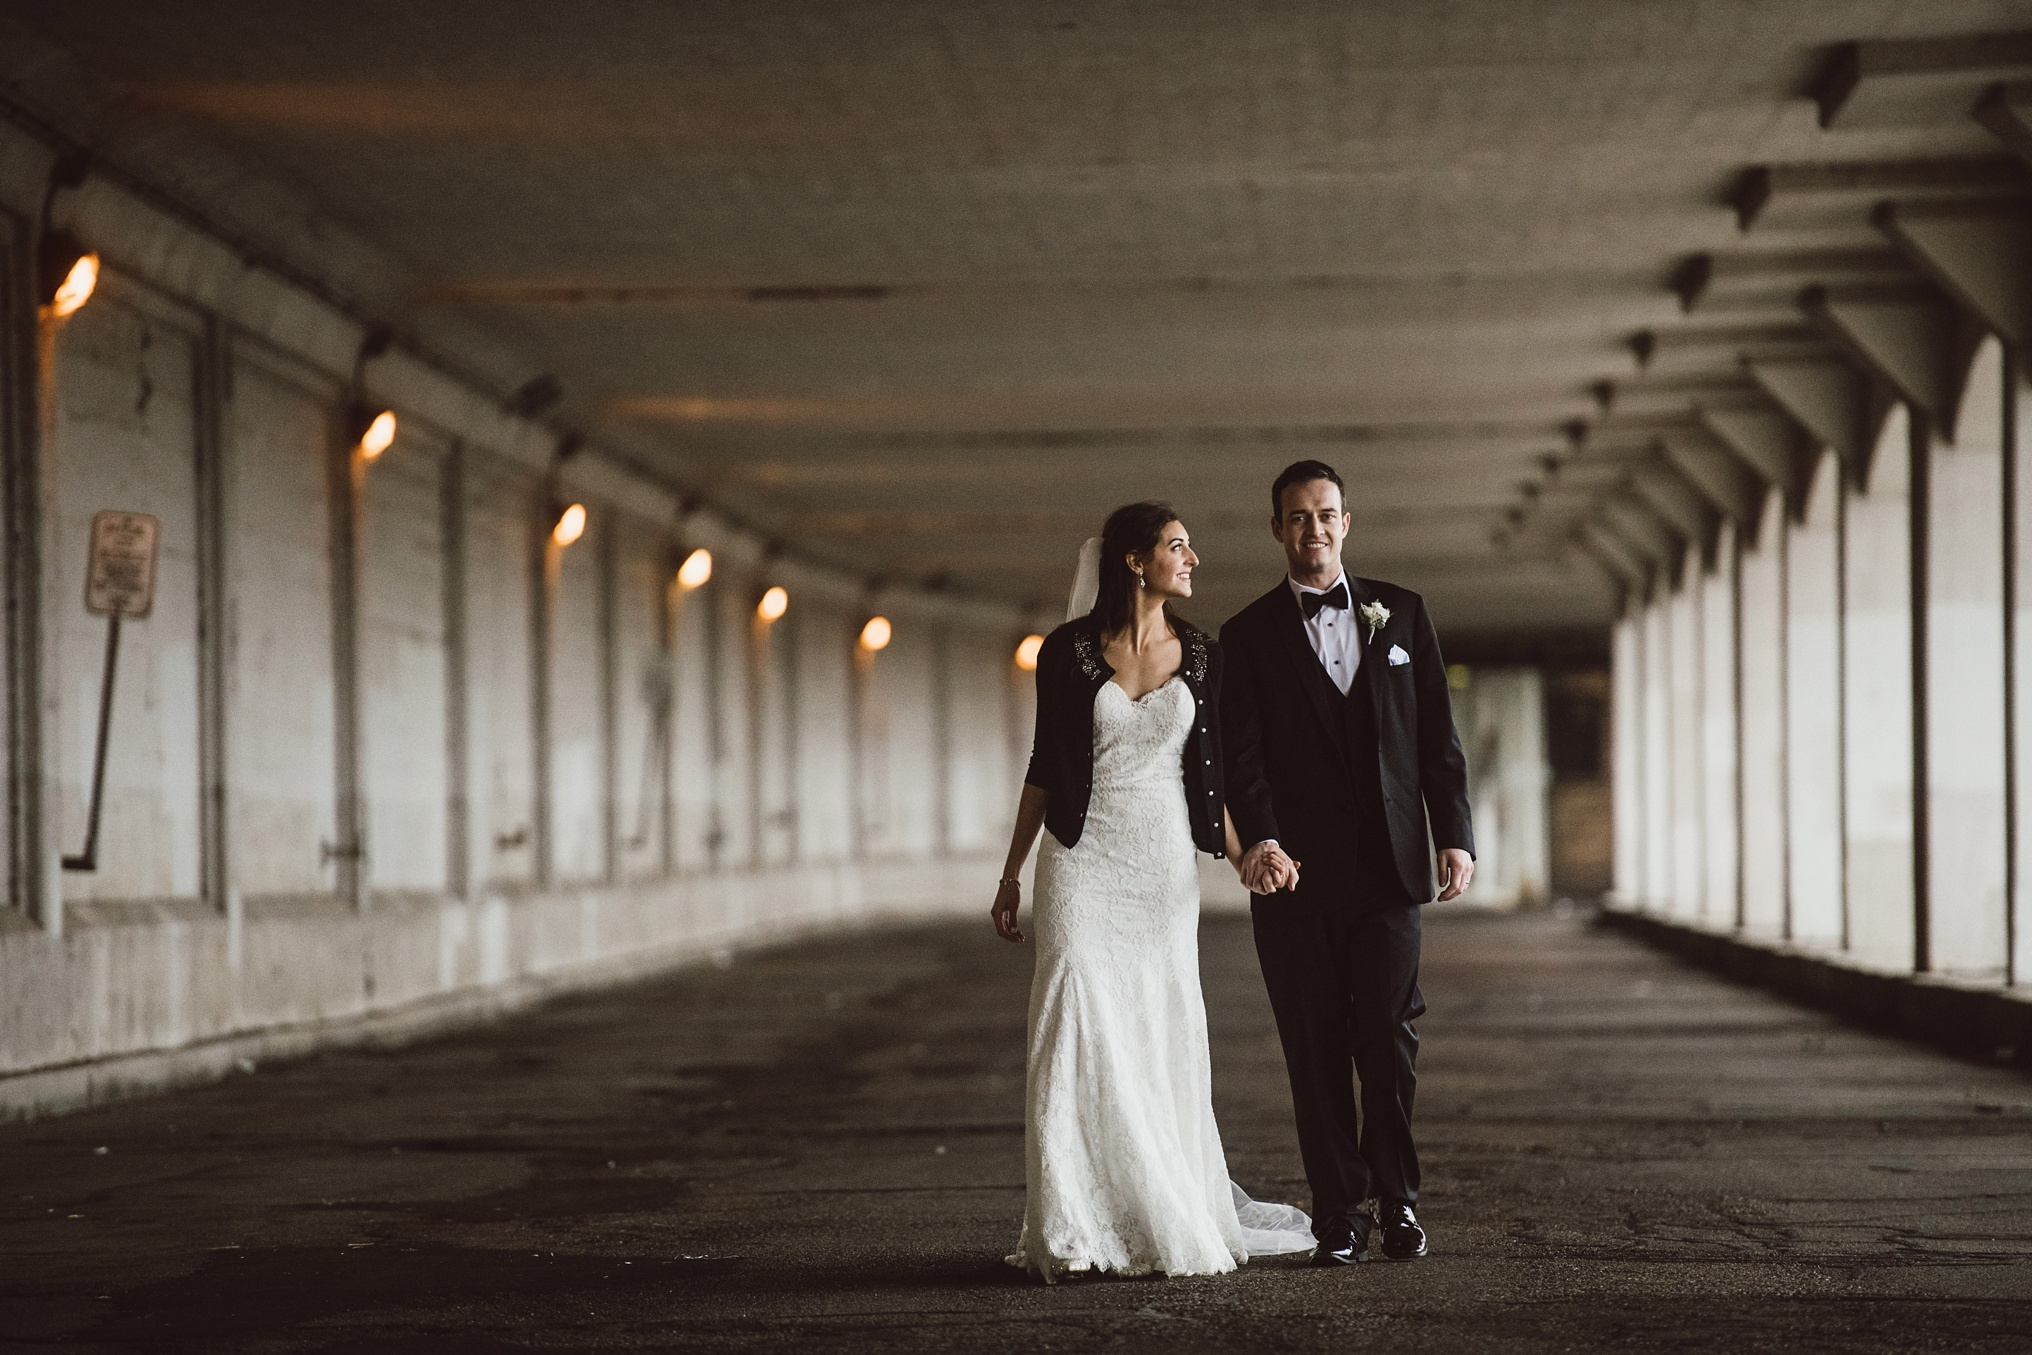 best_wedding_photography_2017_by_lucas_botz_photography_031.jpg